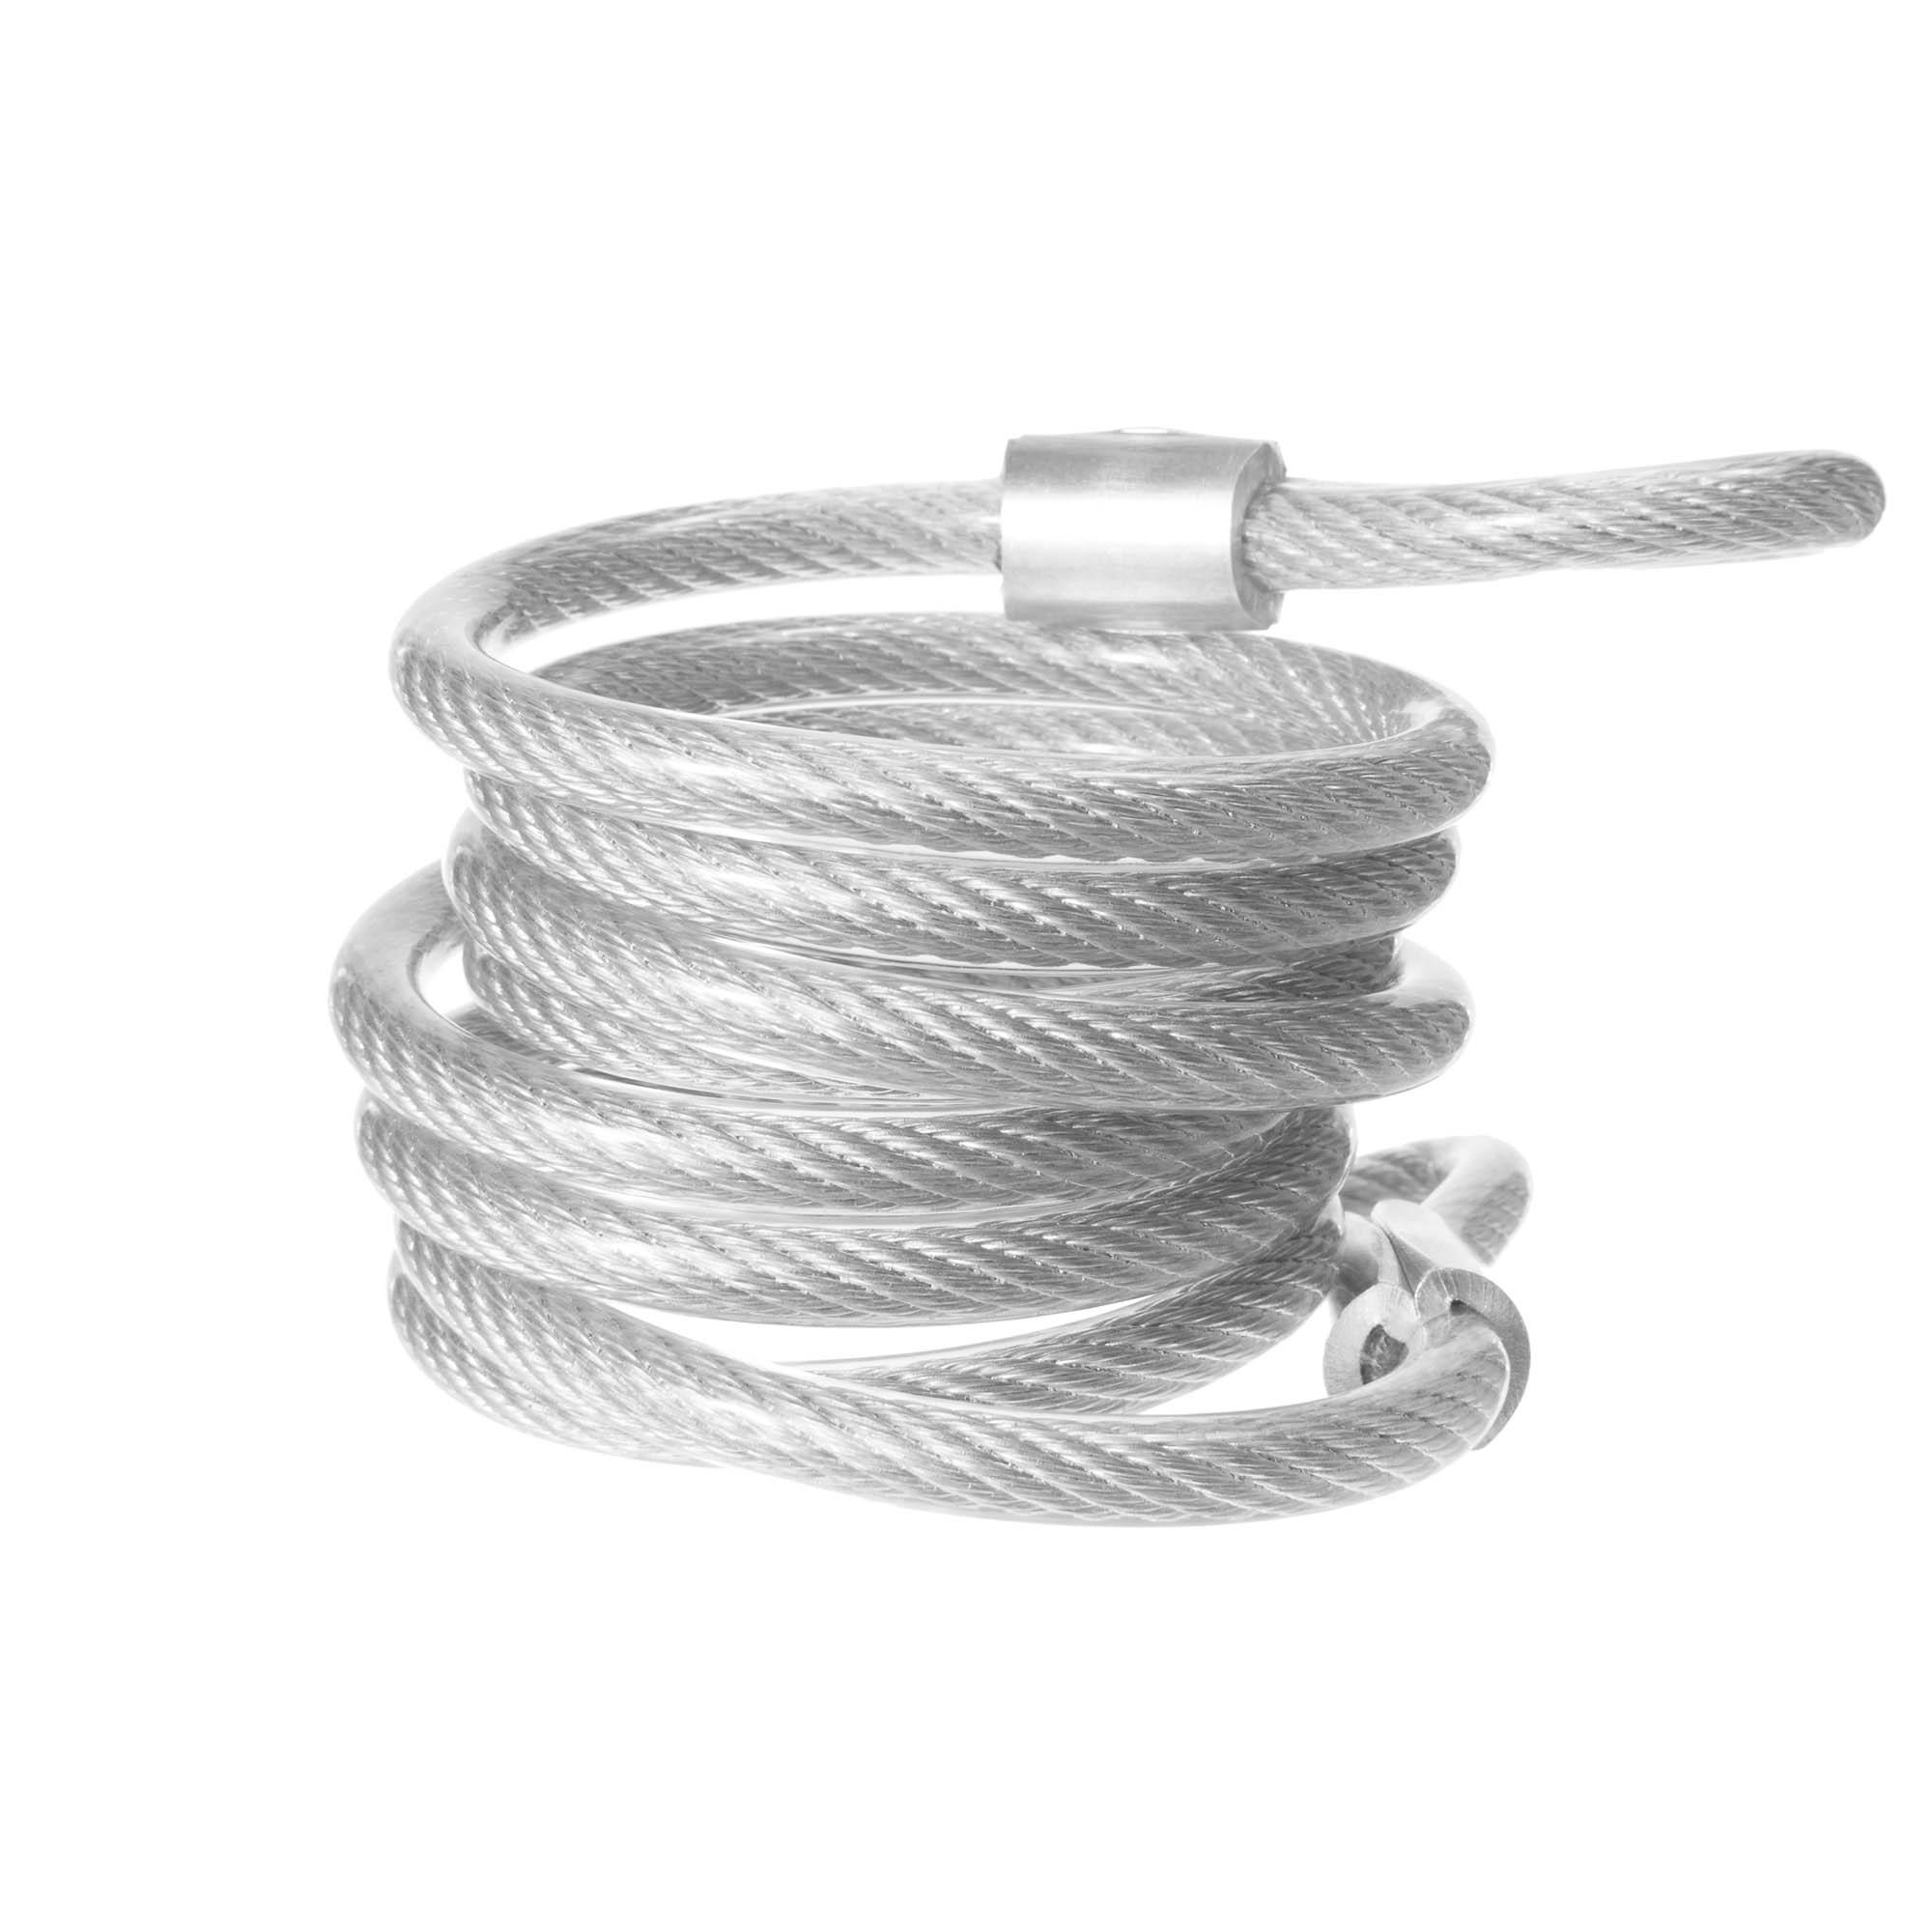 cabos-e-correntes